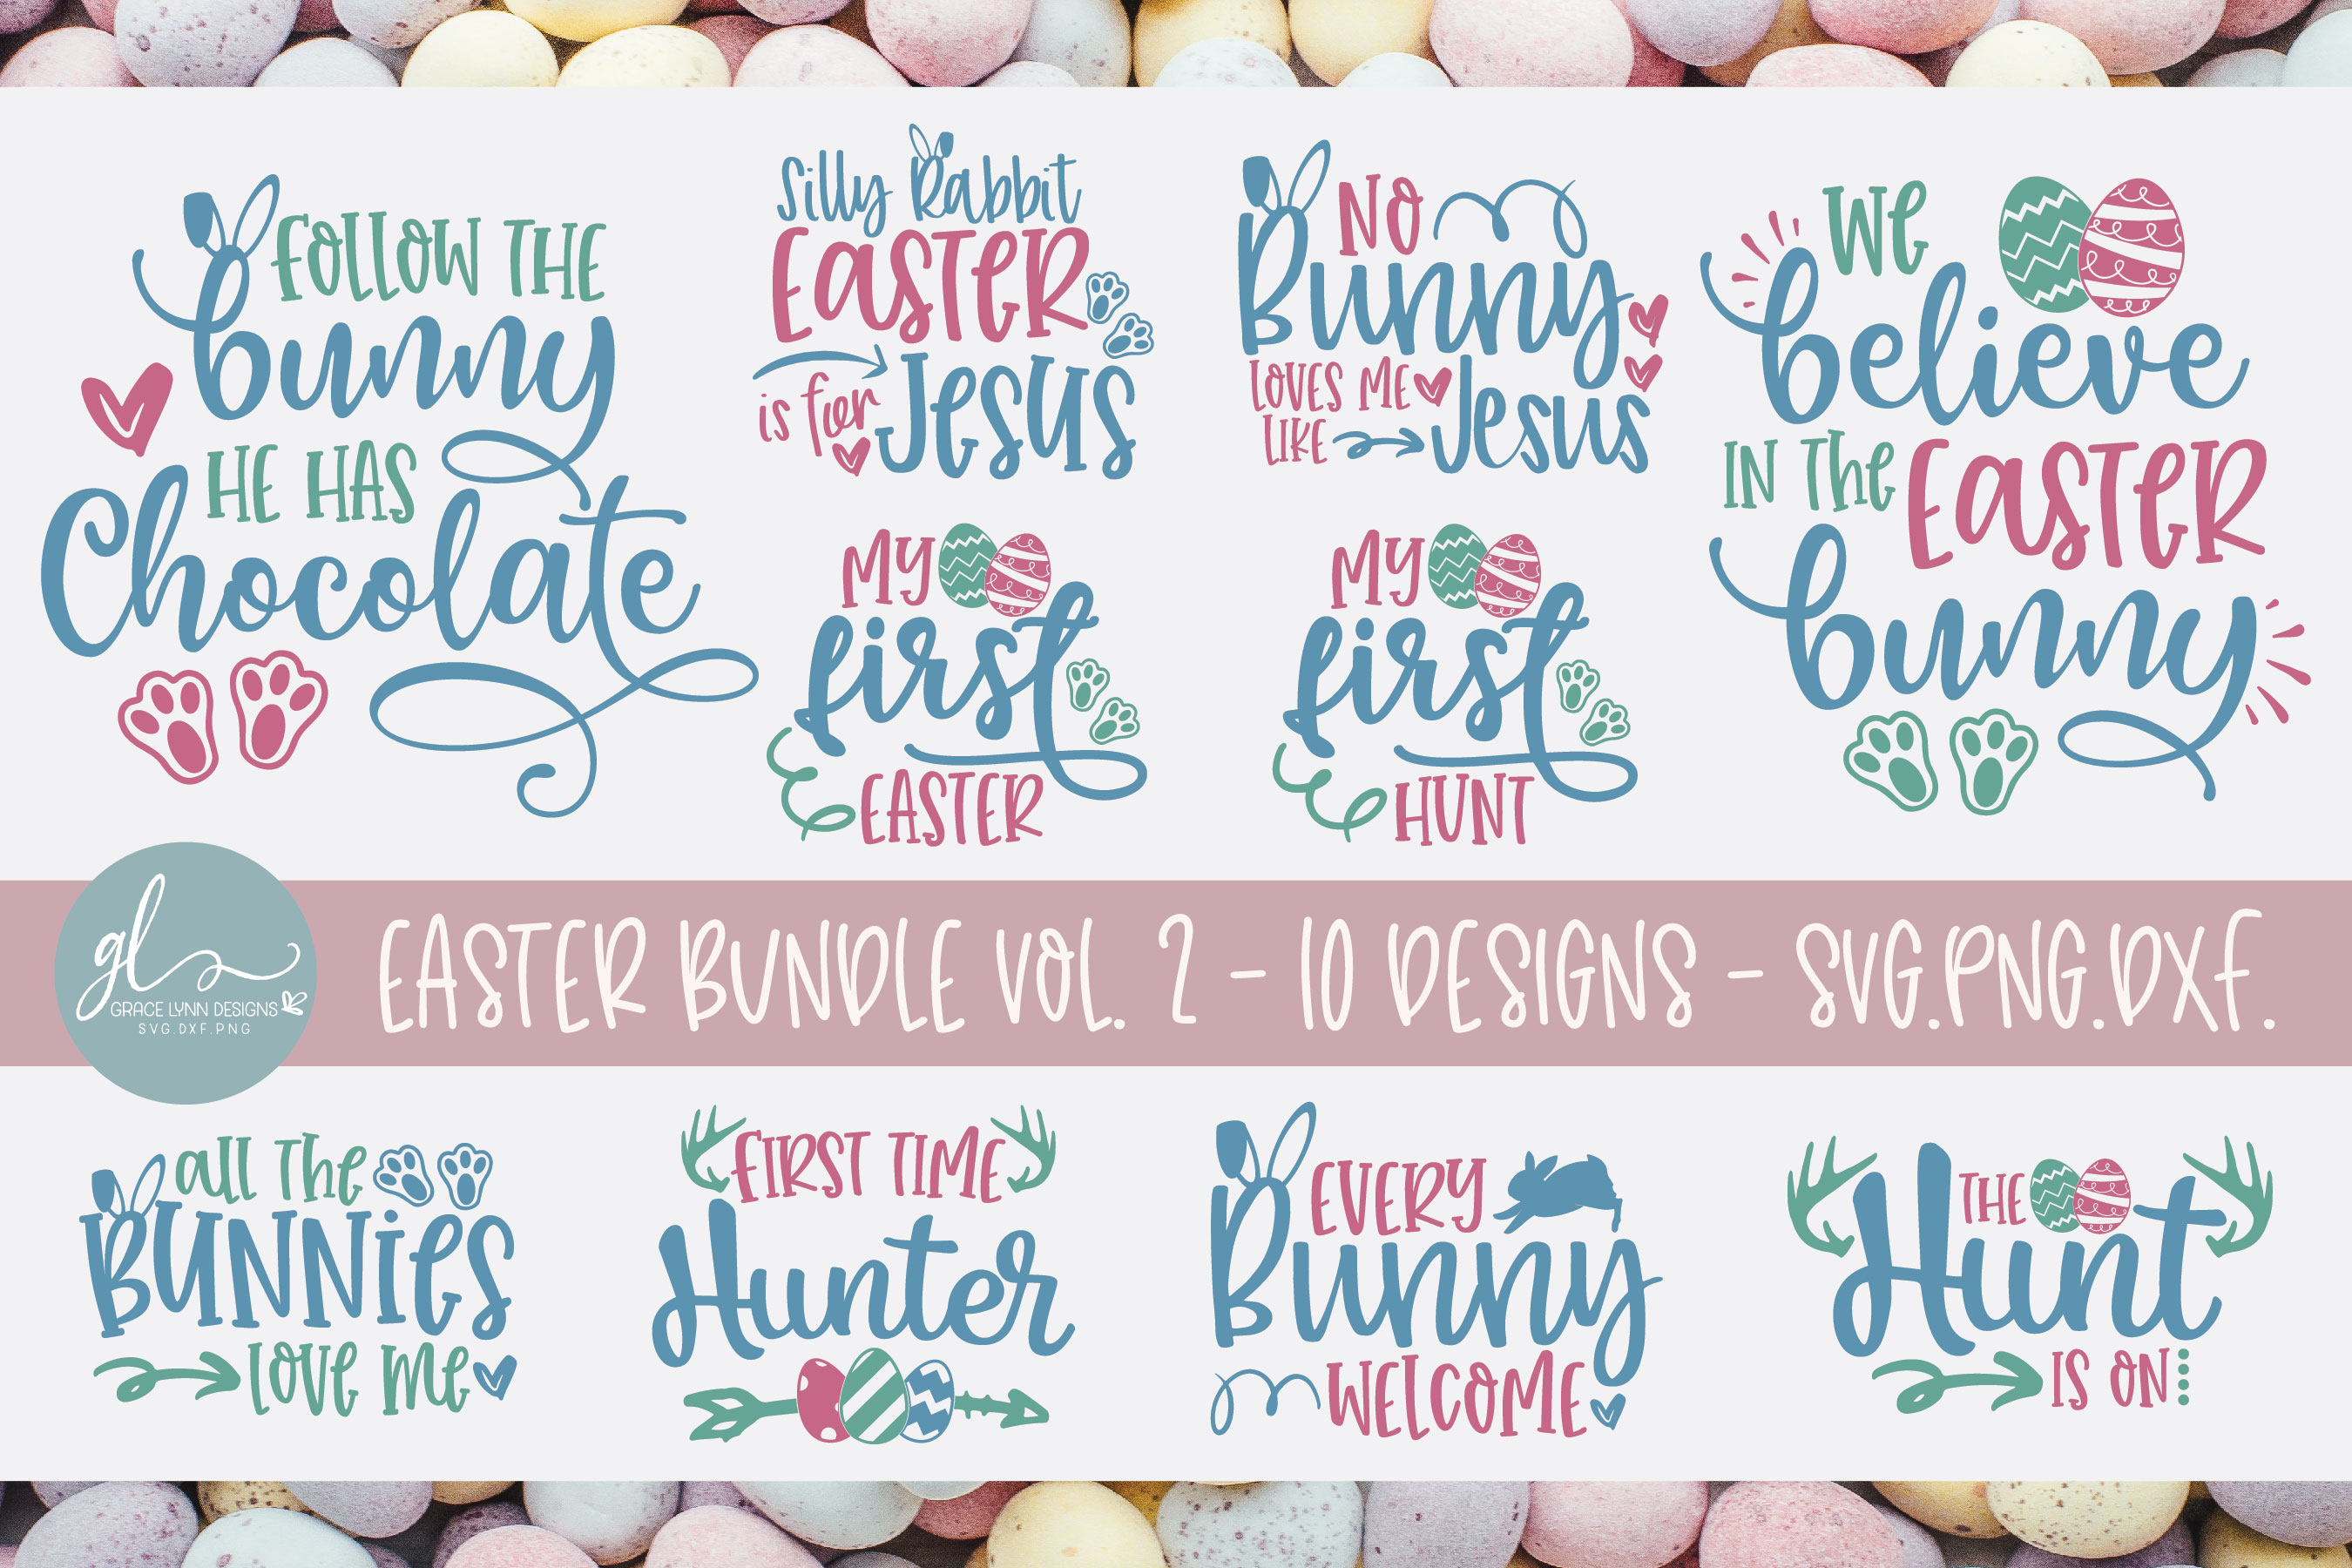 Huge Bundle Of Bundles - 160 SVG Designs - 13 Mini Bundles example image 10